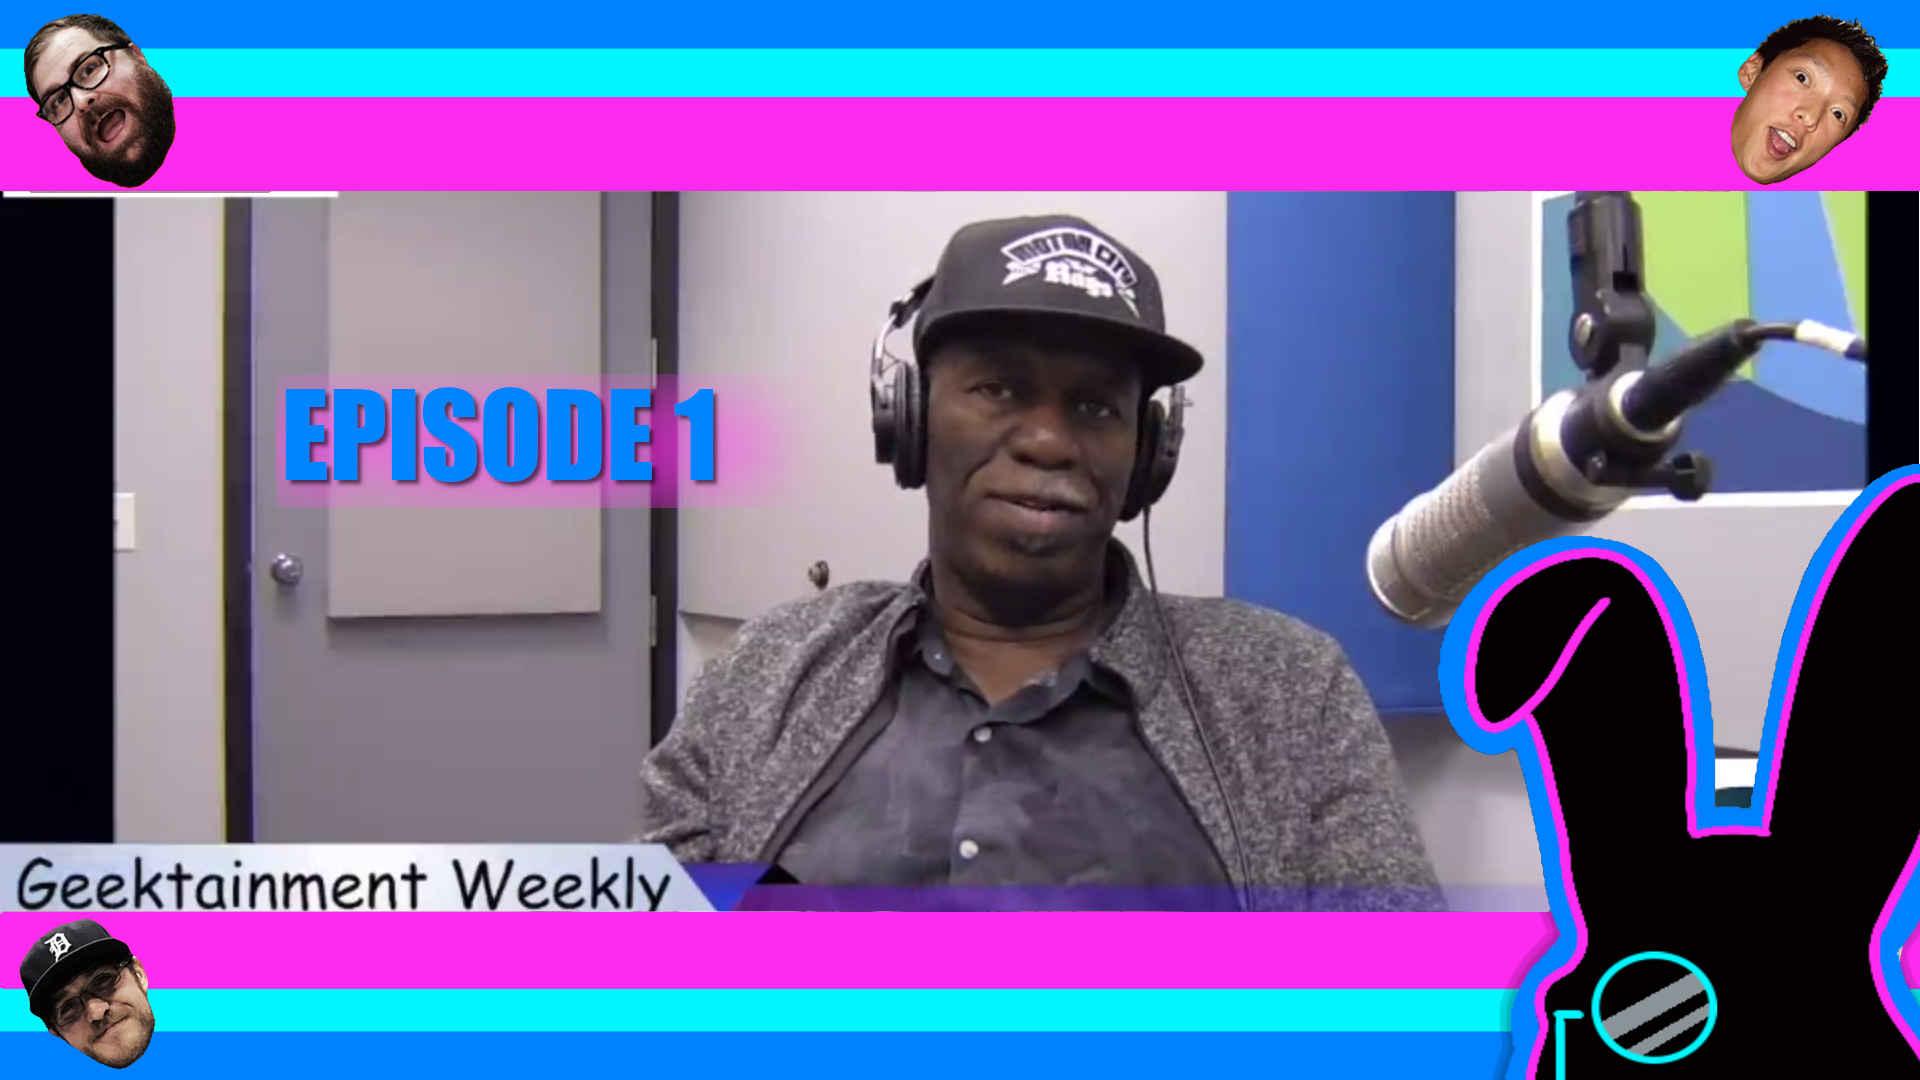 Geektainment Weekly - Episode 1